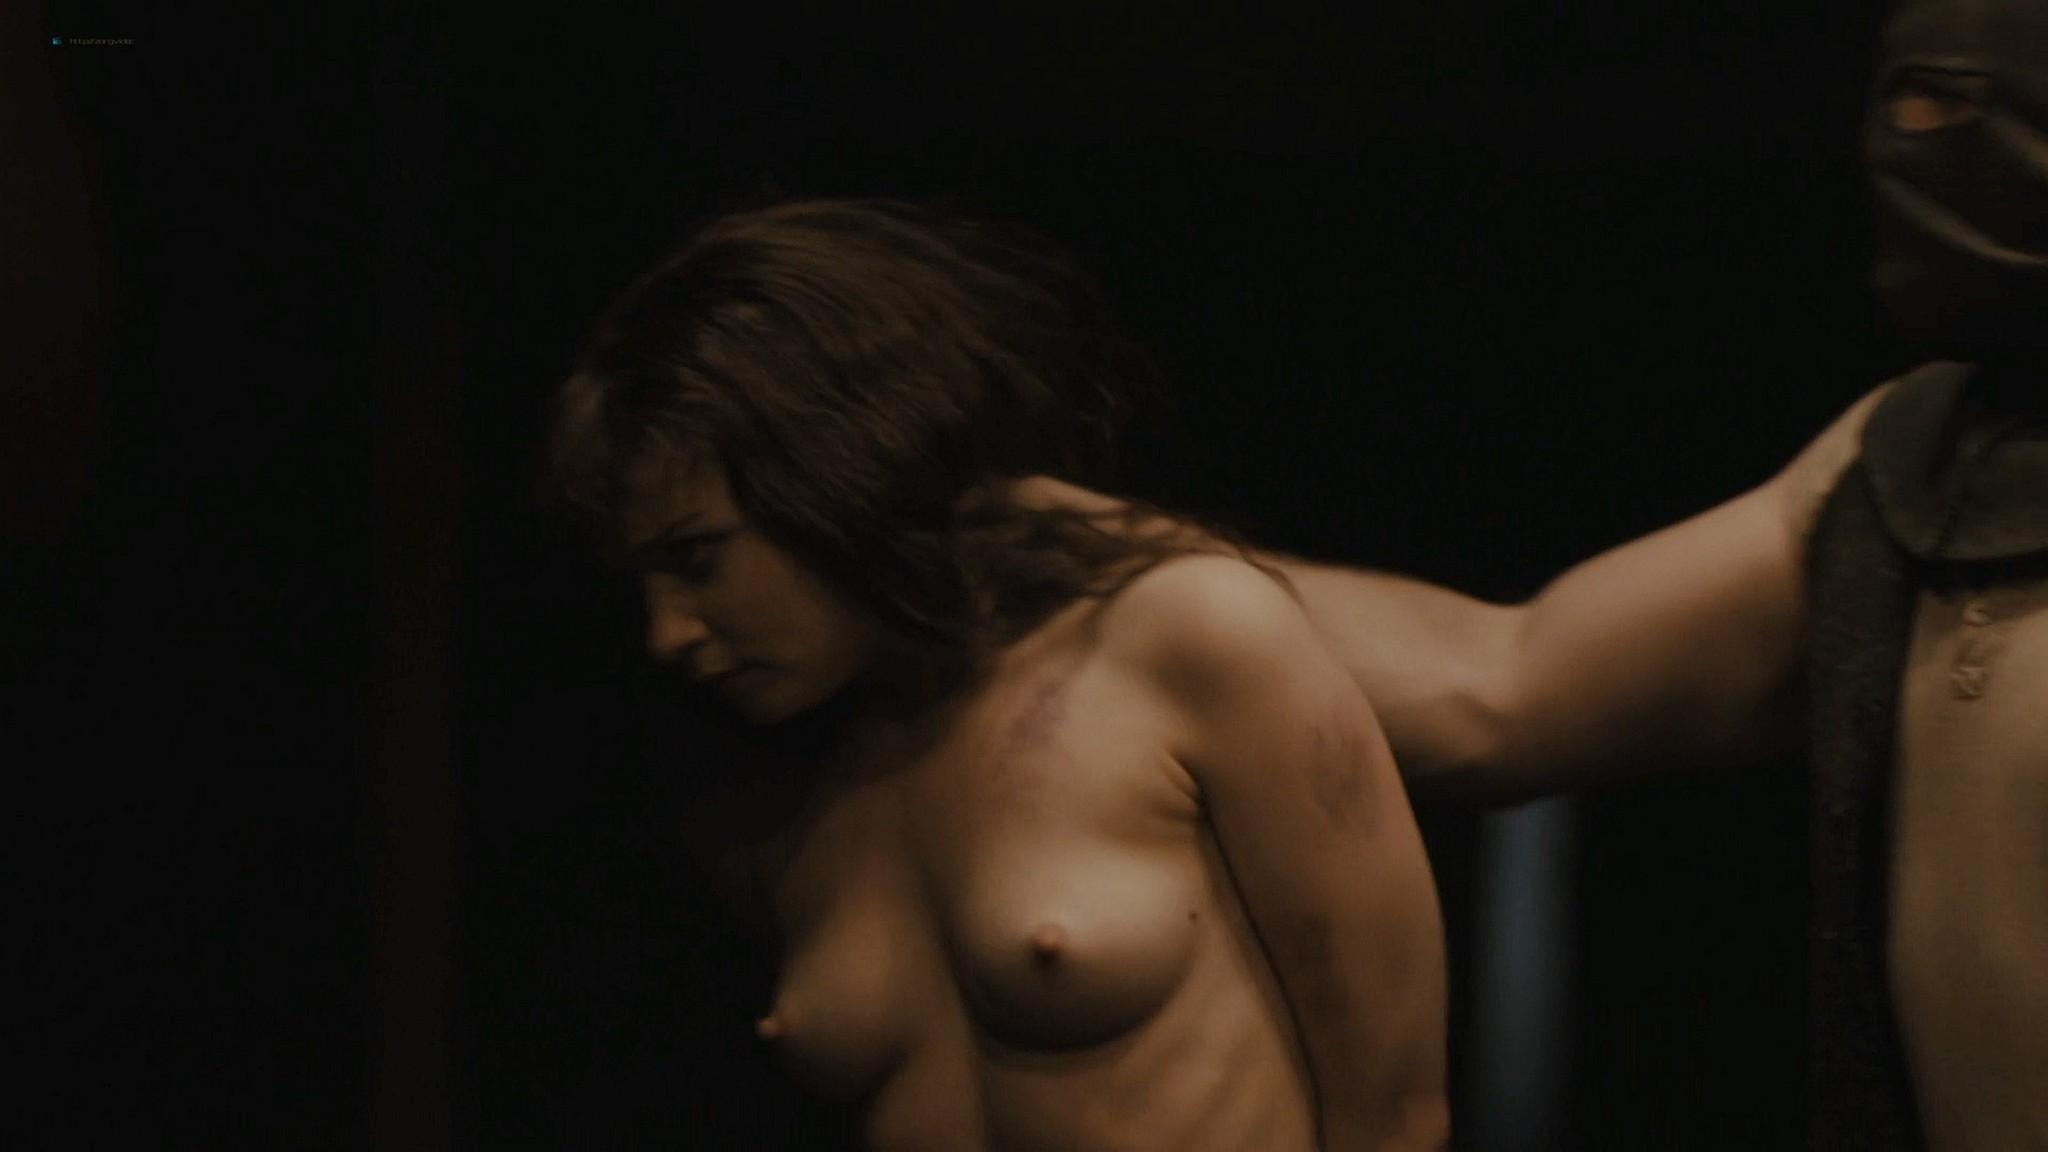 Jessica Barden nude full frontal, bush and boobs – Penny Dreadful s03e02 (2016) HD 1080p (4)